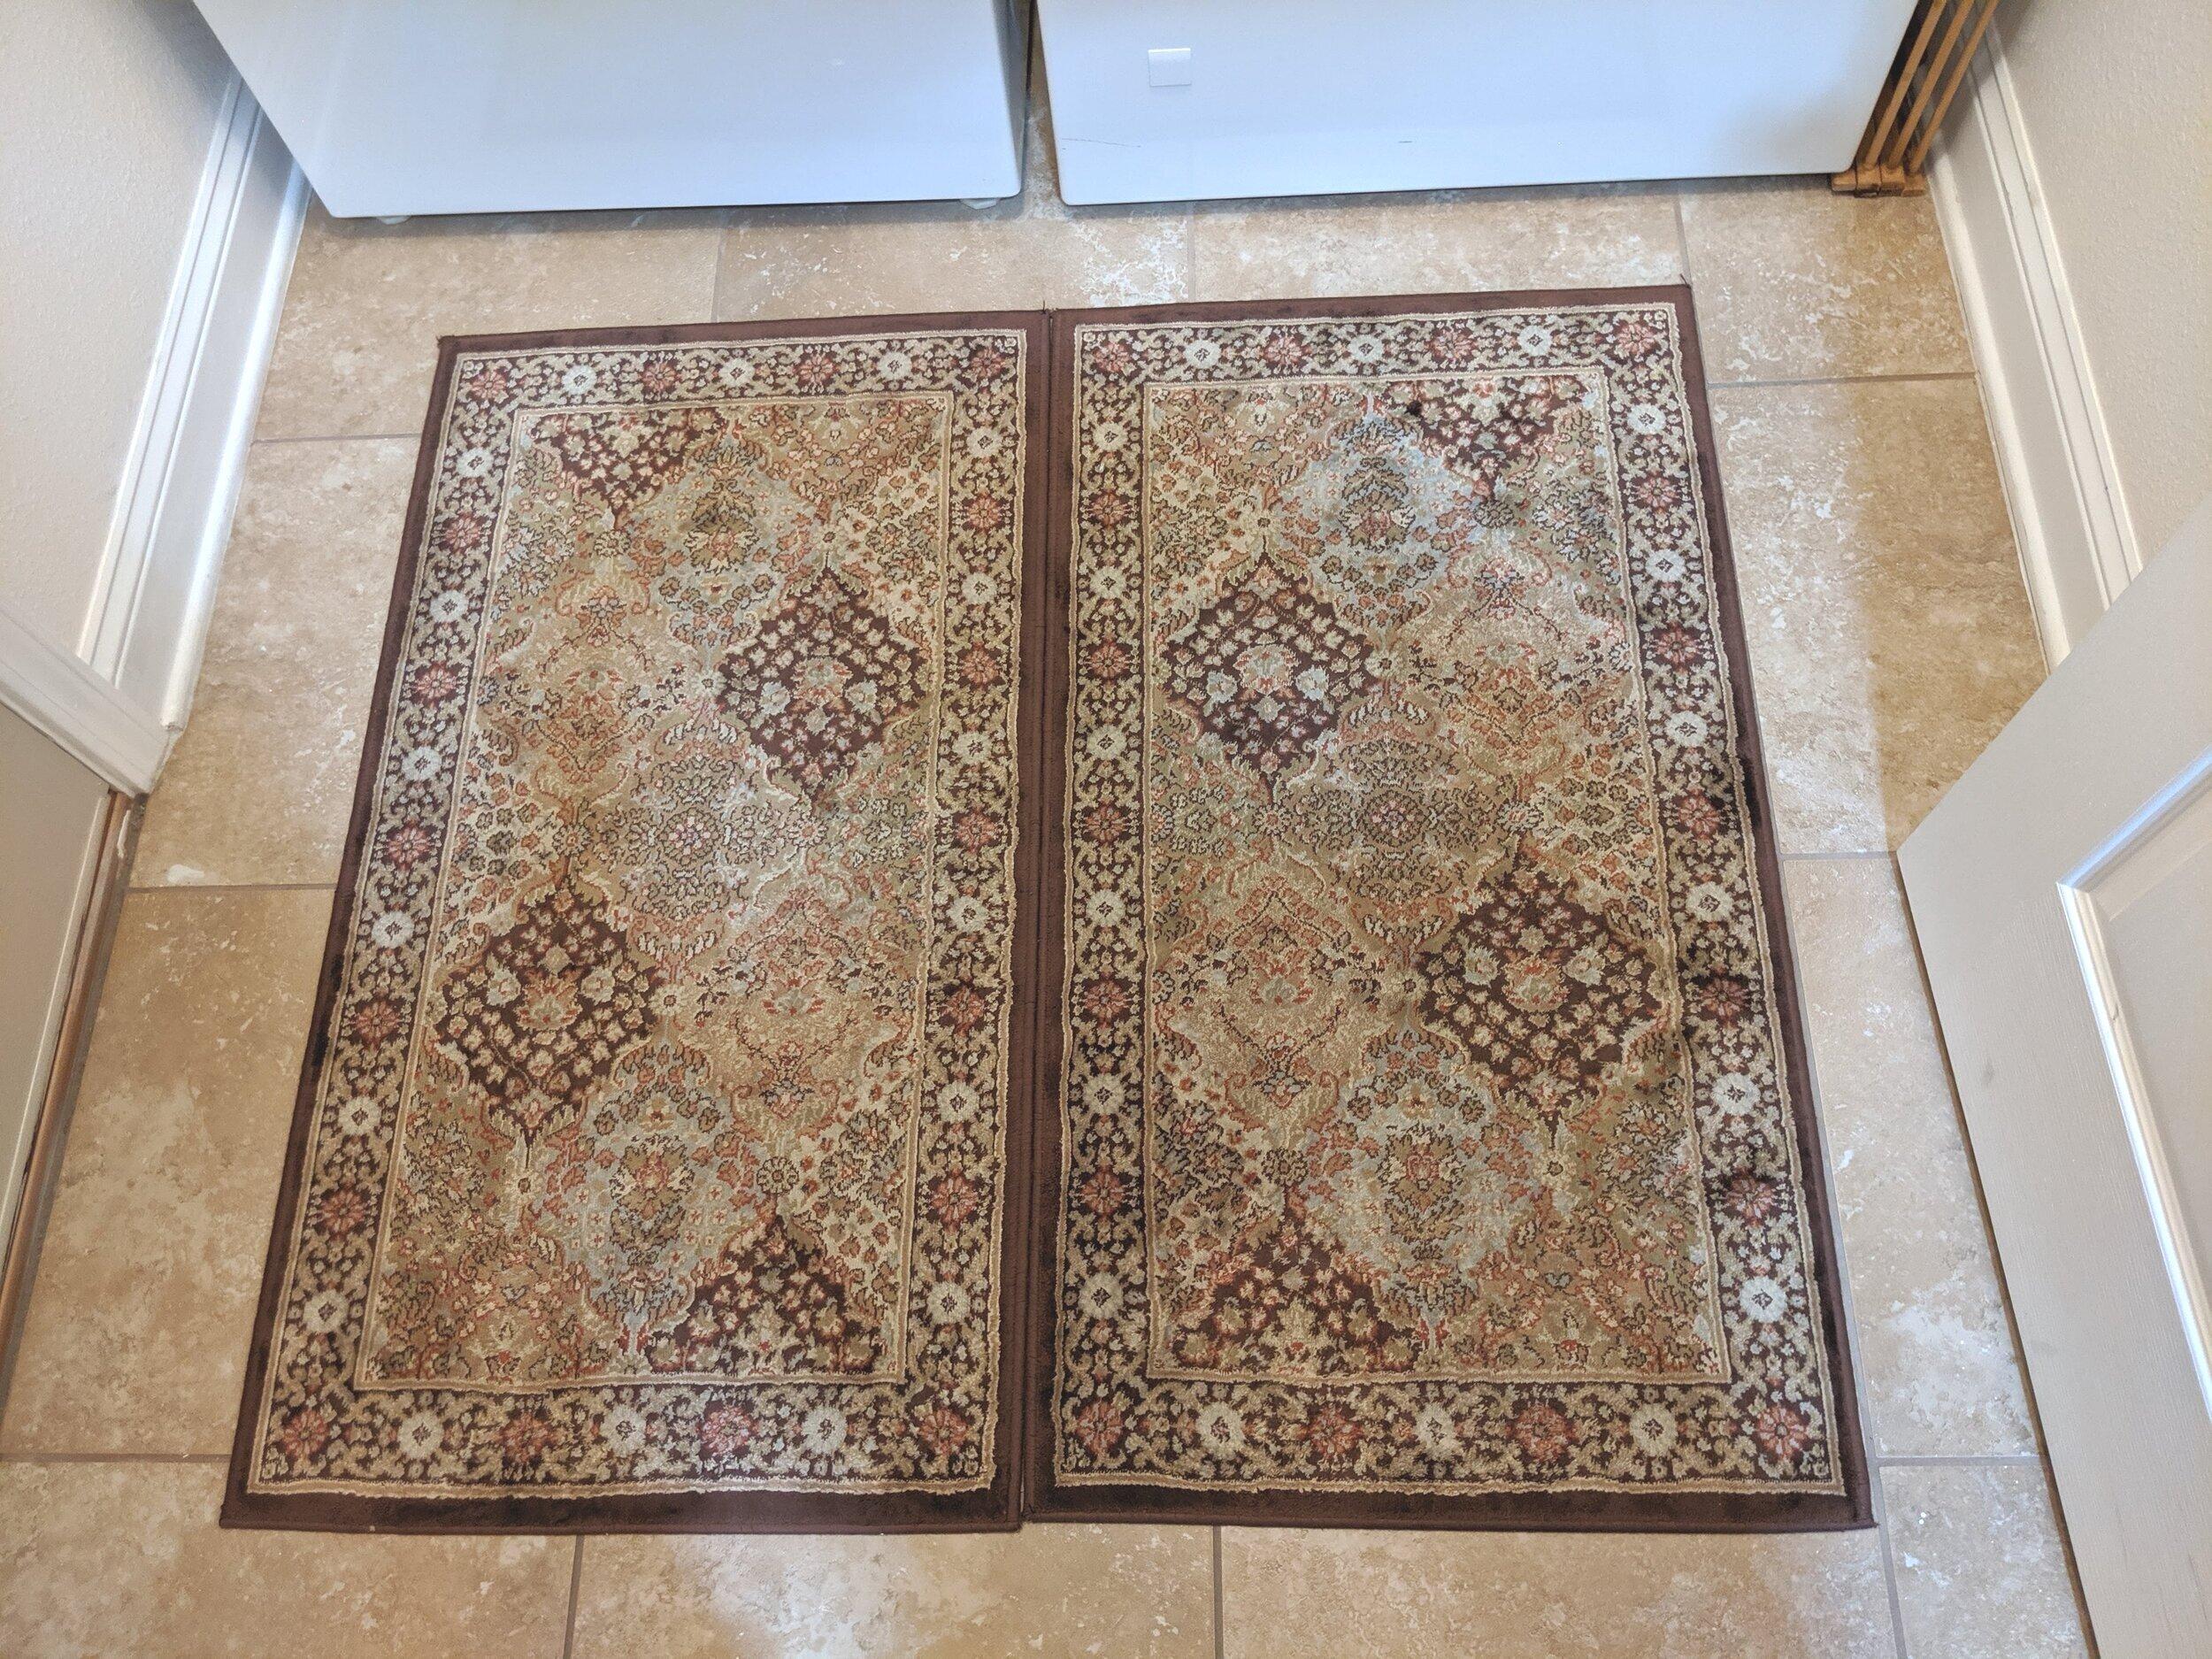 Big rug DIY